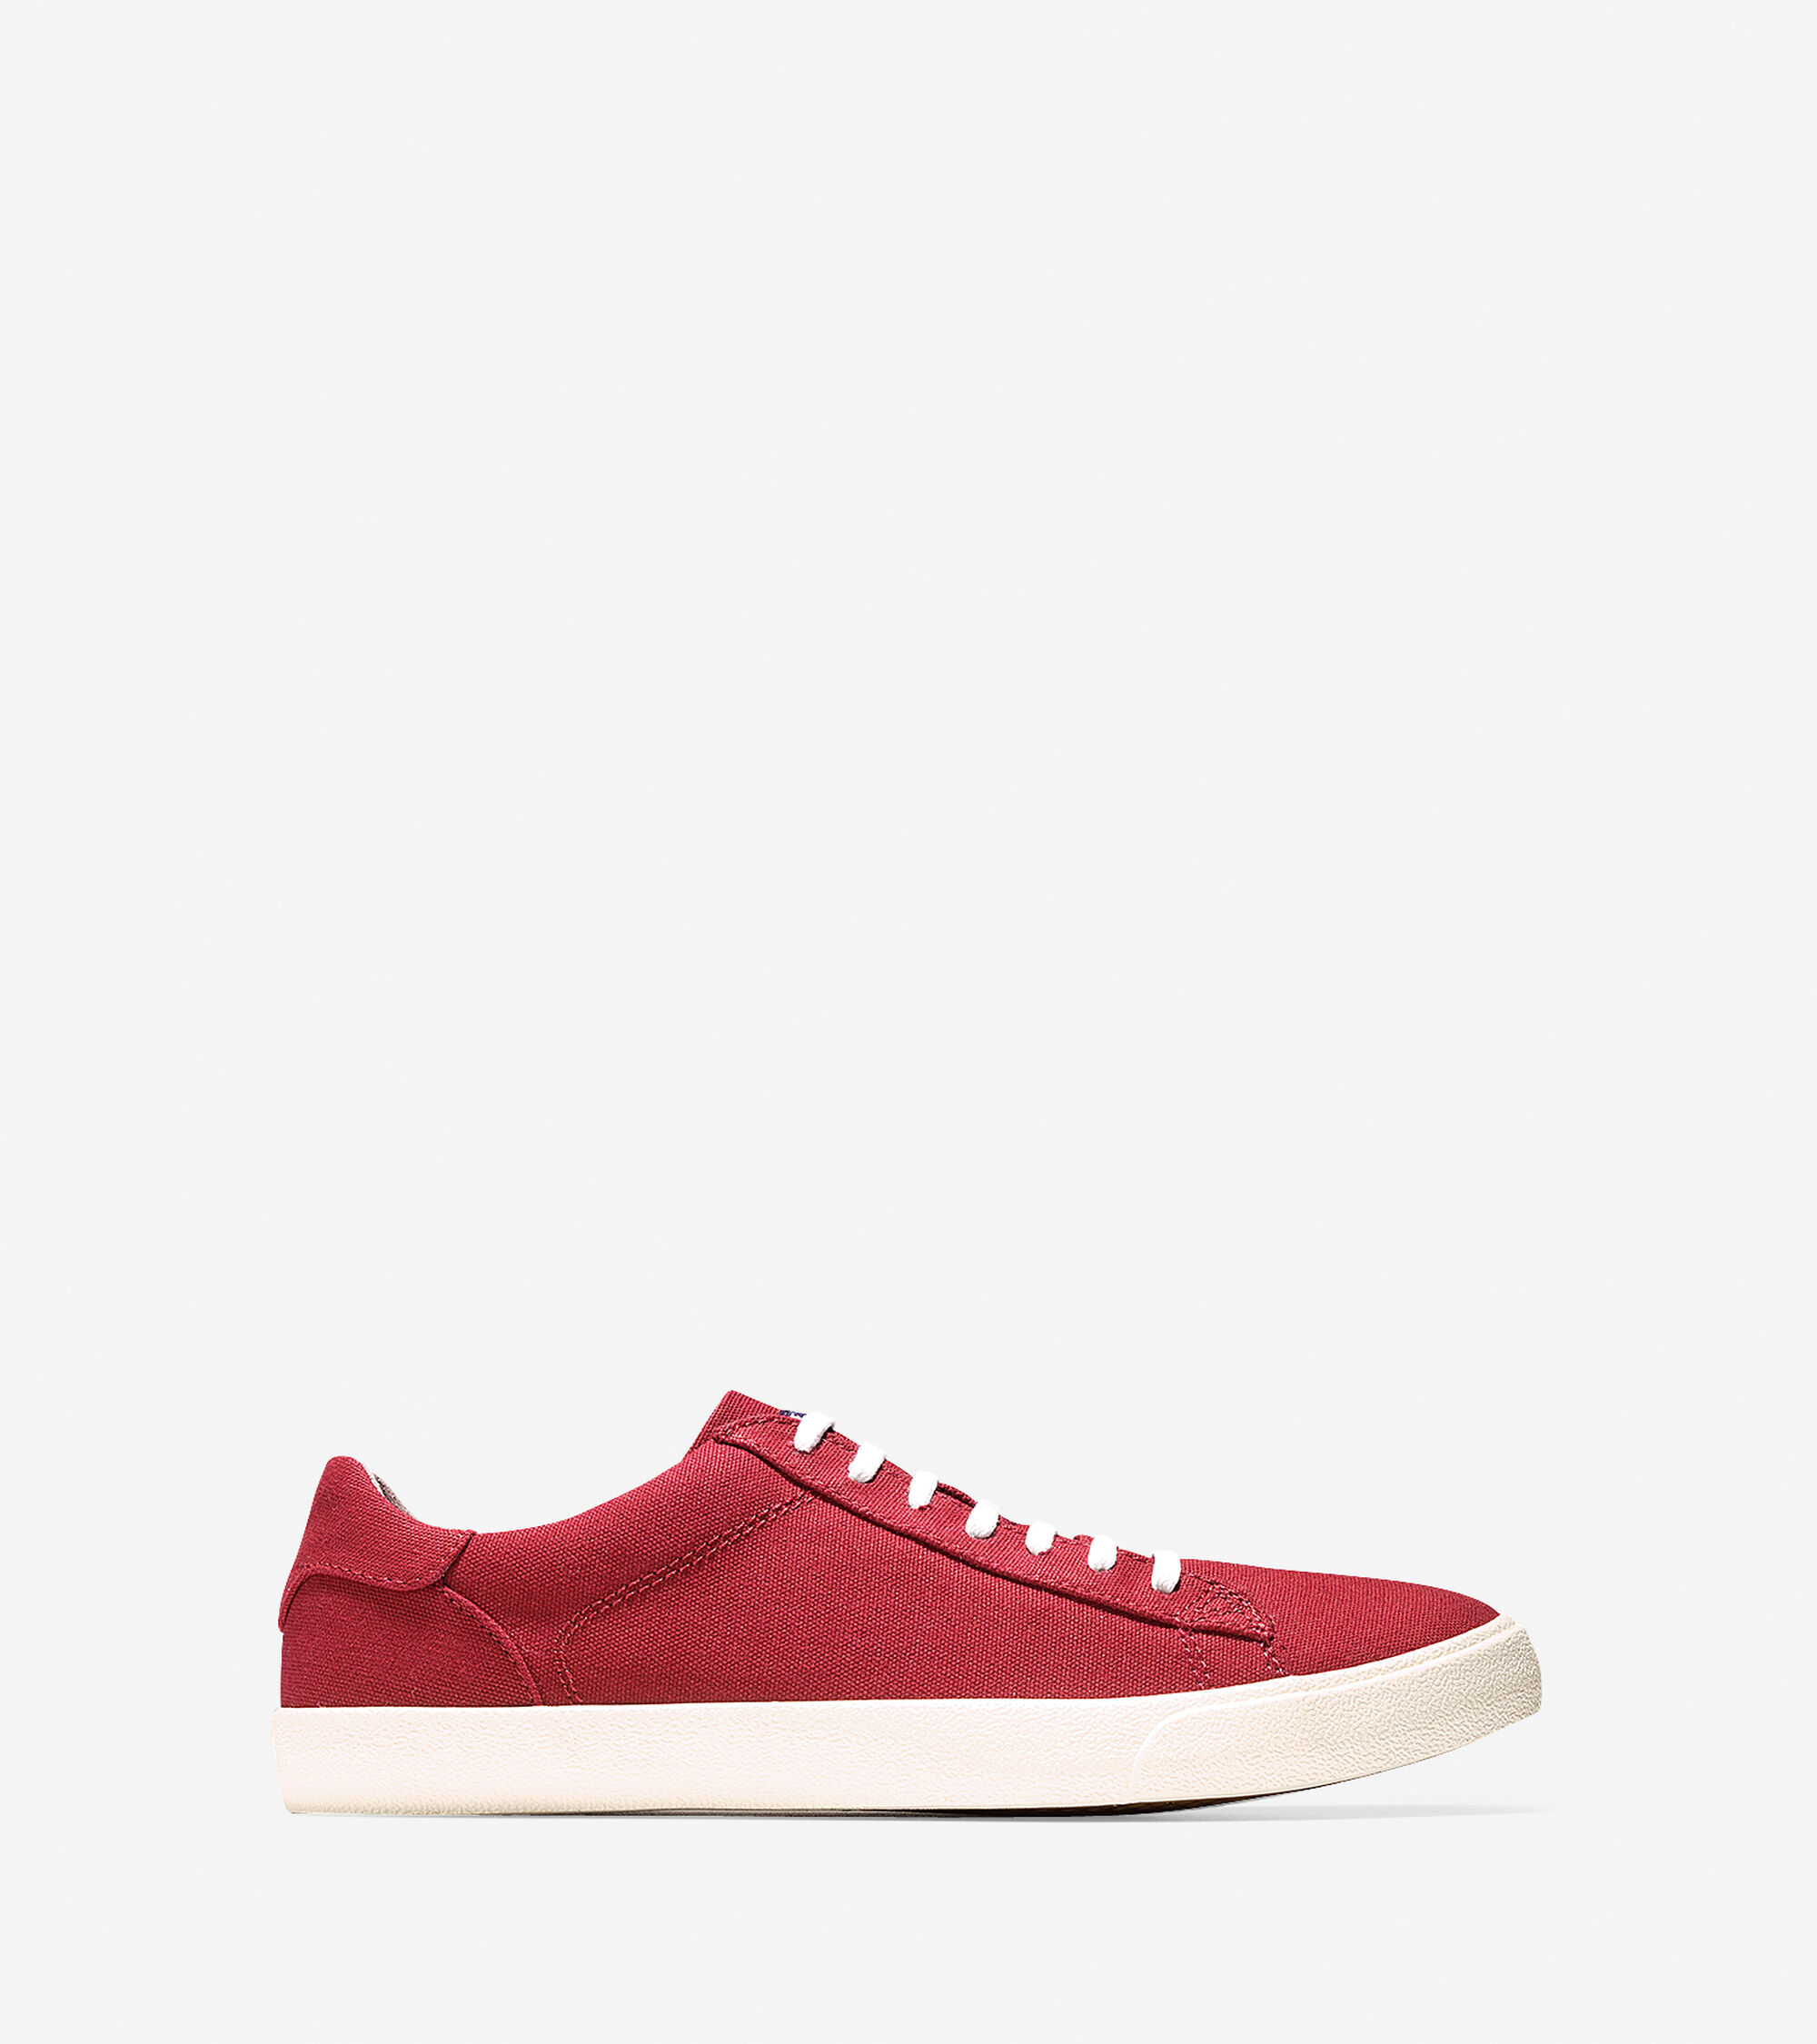 Sneakers > Men's Trafton Club Court Sneaker